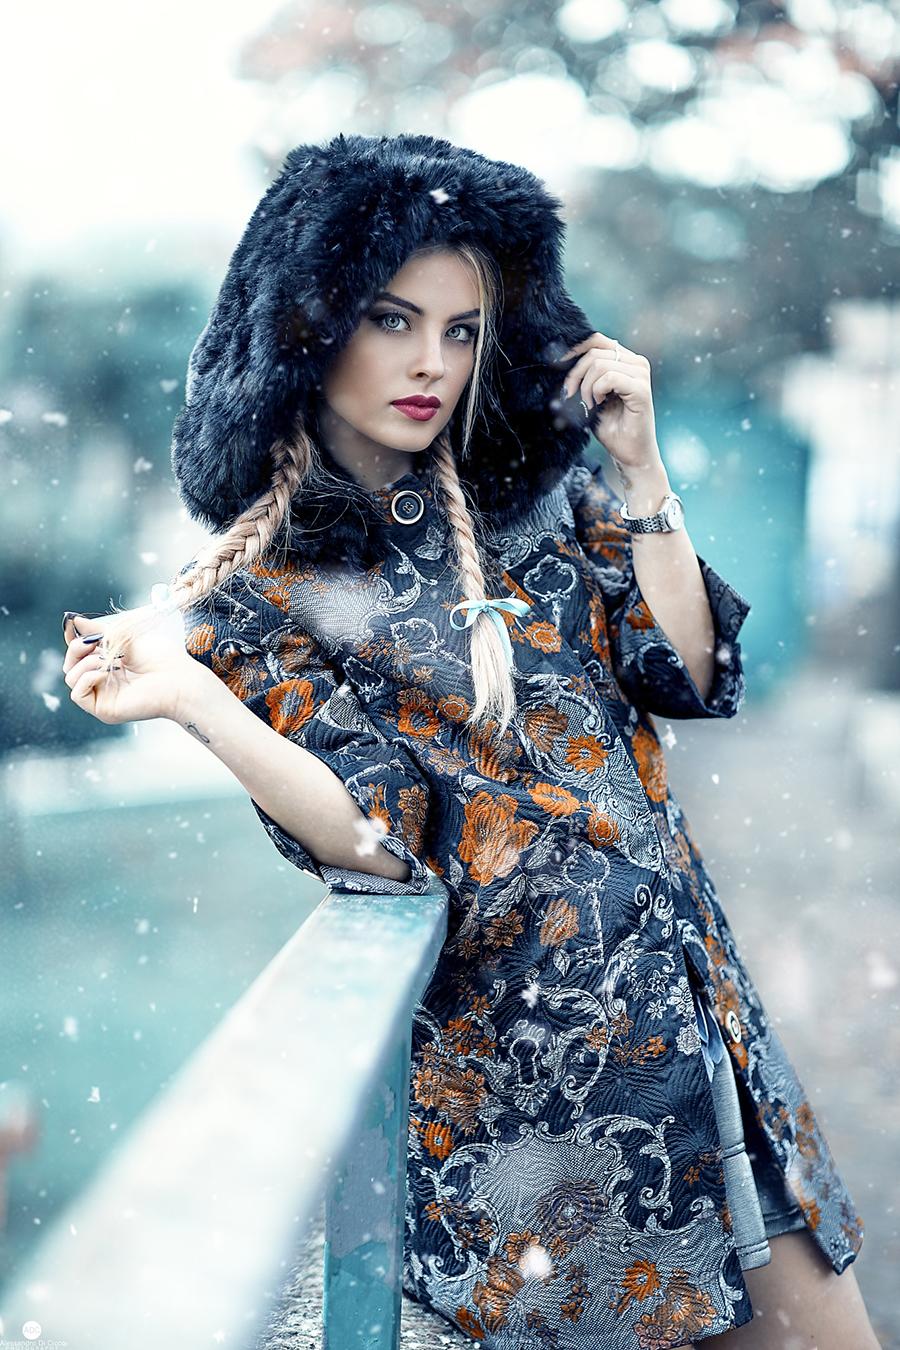 Gorgeous Girl Wallpaper Alessandro Di Cicco Photography Shockblast